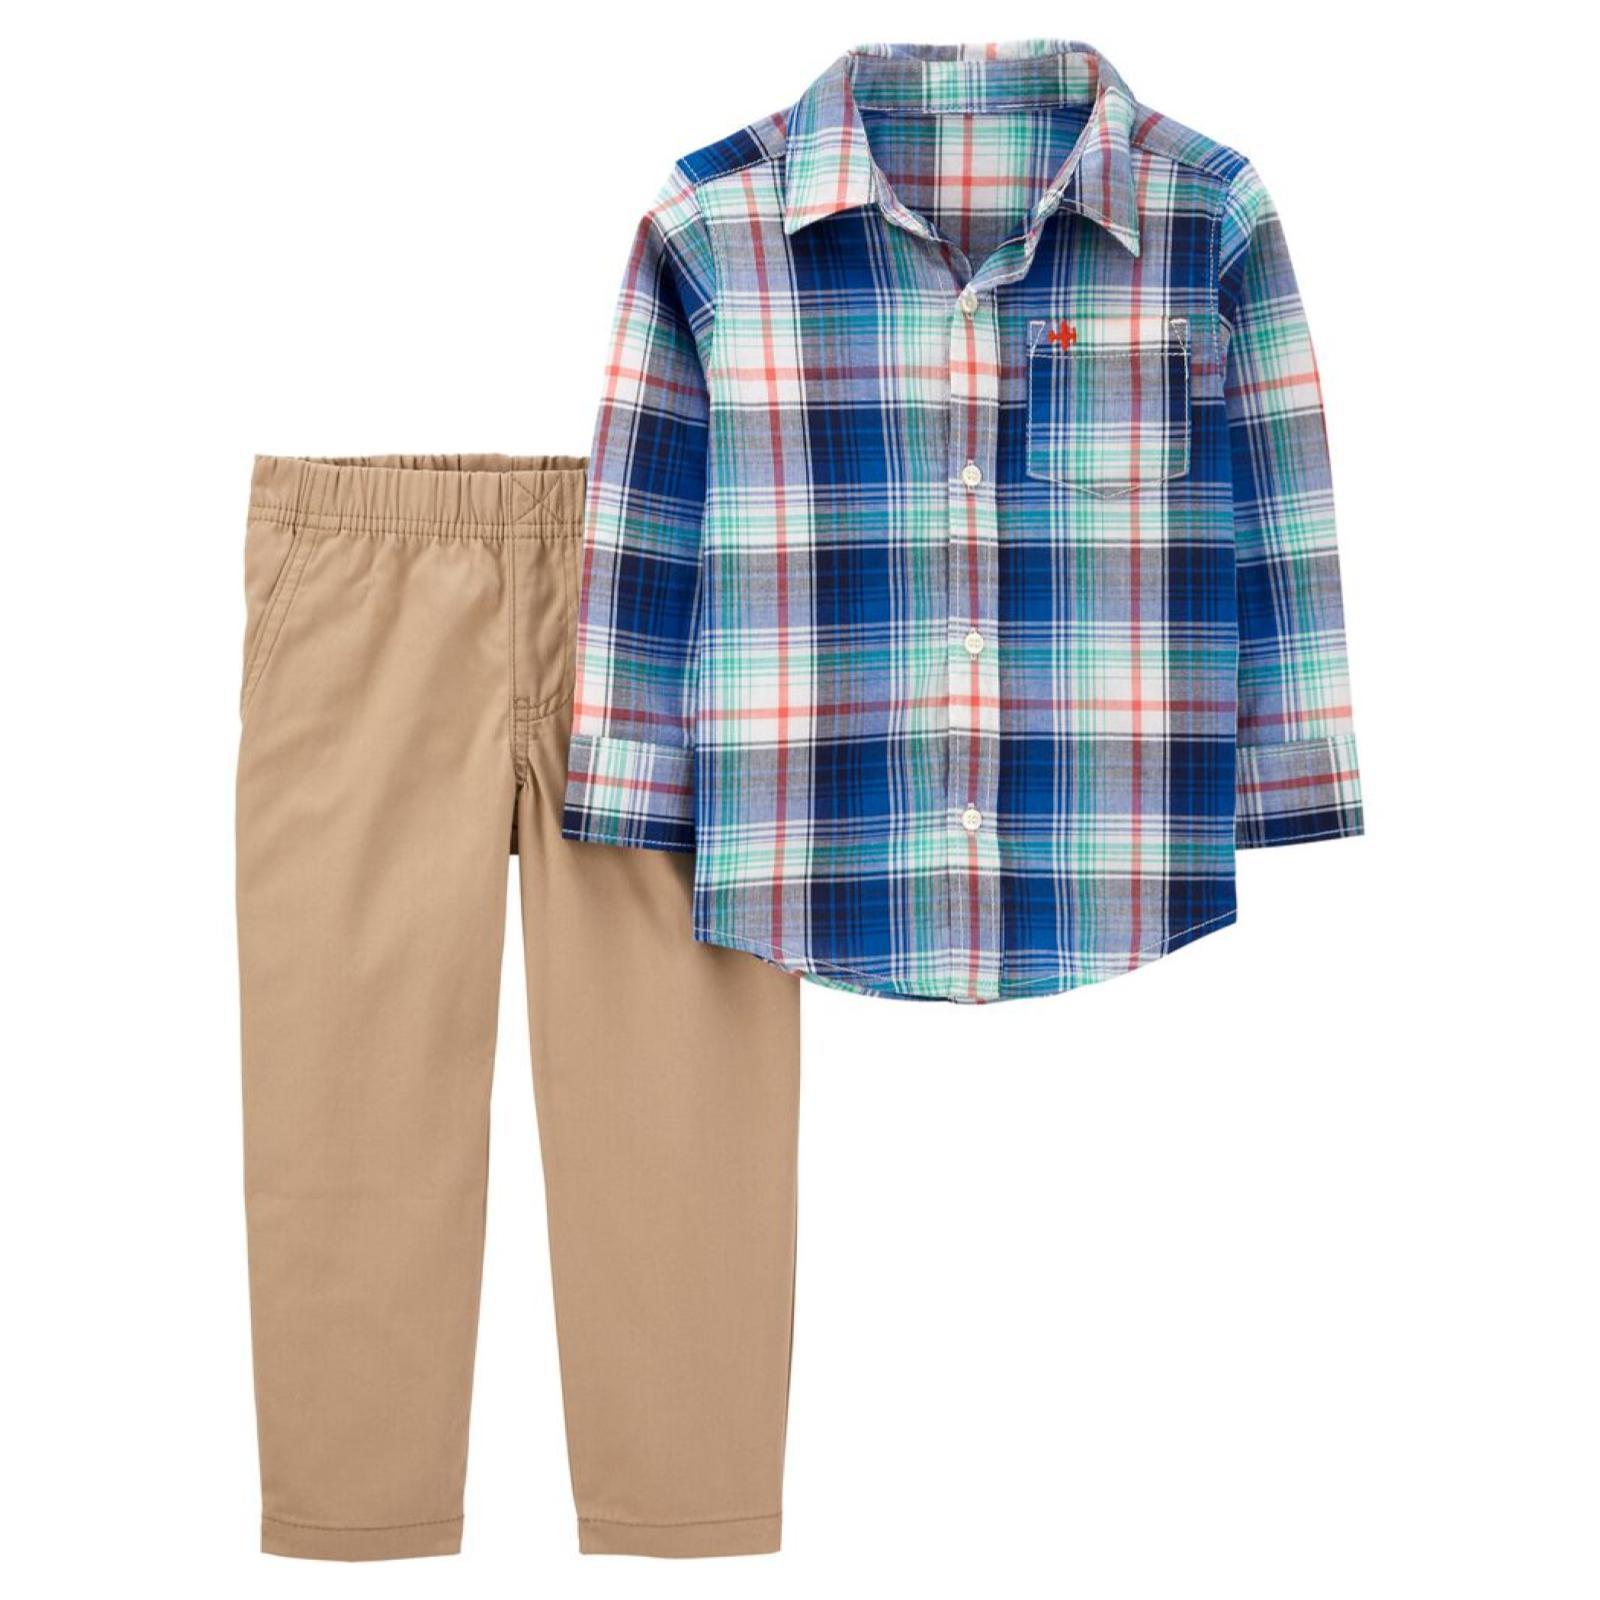 Conjunto 2 pecas xadrez azul - camisa manga longa e calca bege